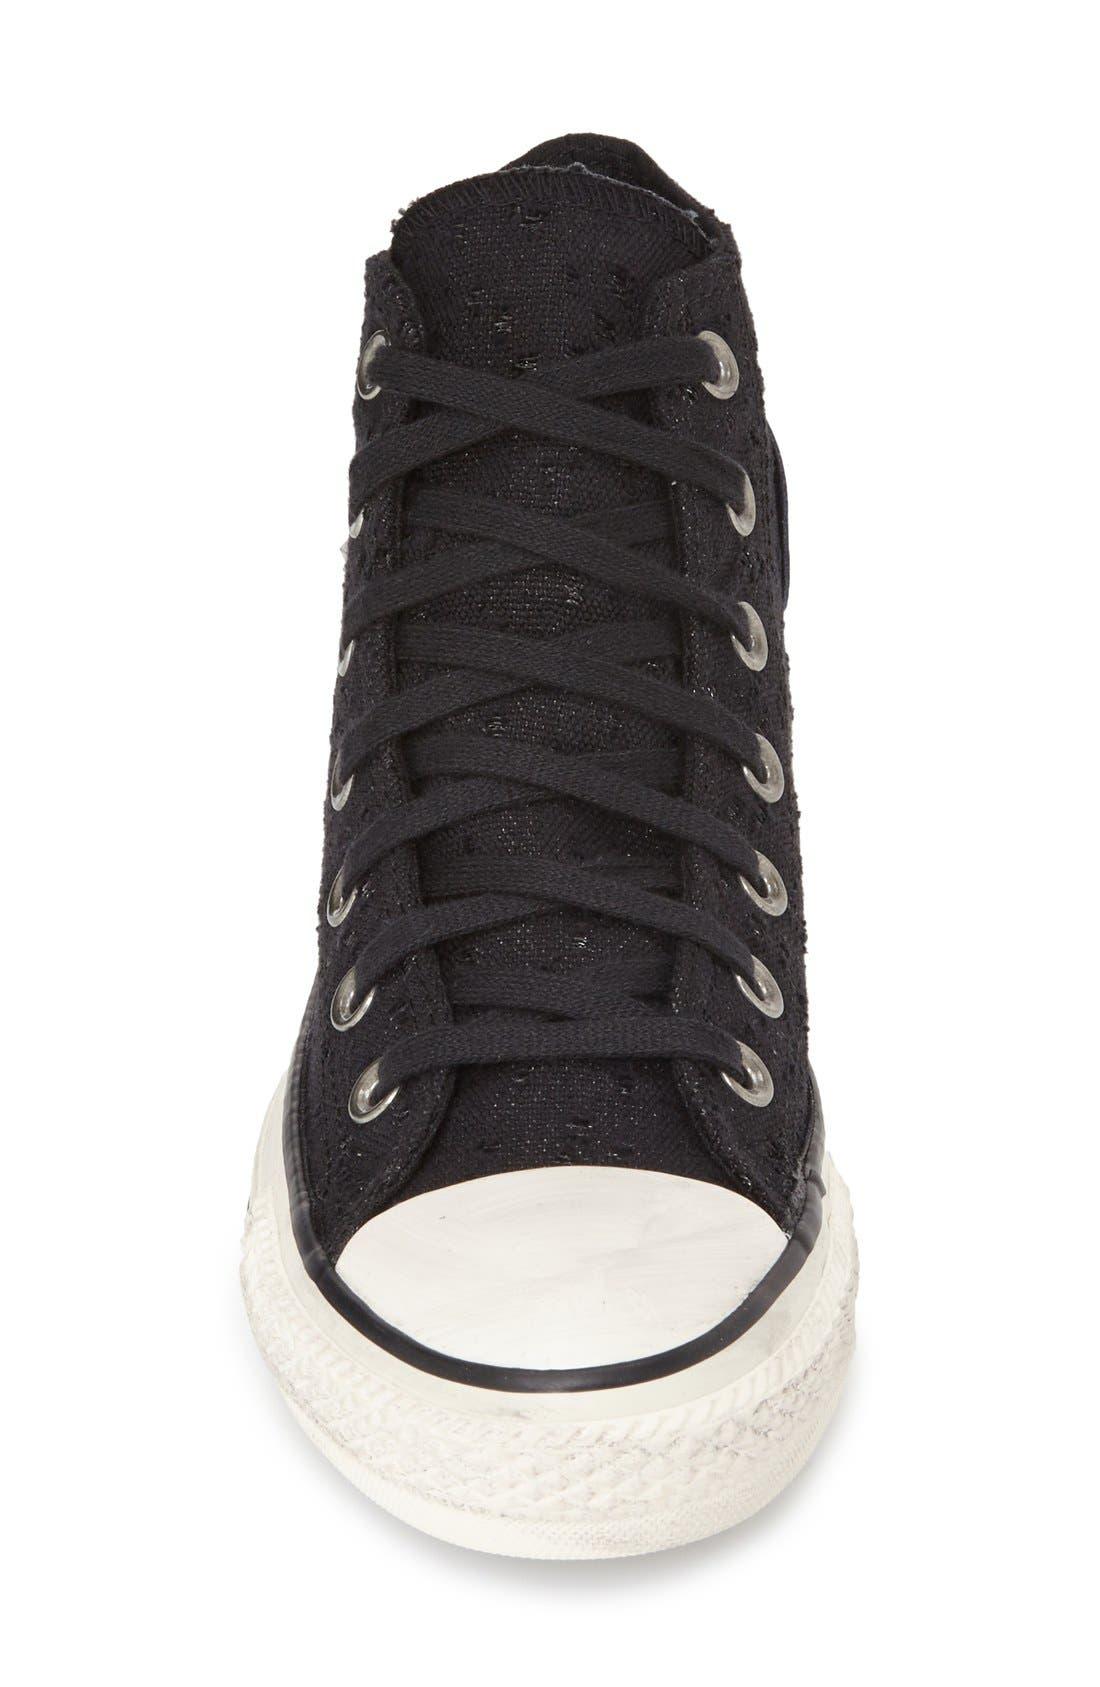 Alternate Image 3  - Converse Chuck Taylor® All Star® 'Star Hardware' High Top Sneaker (Women)